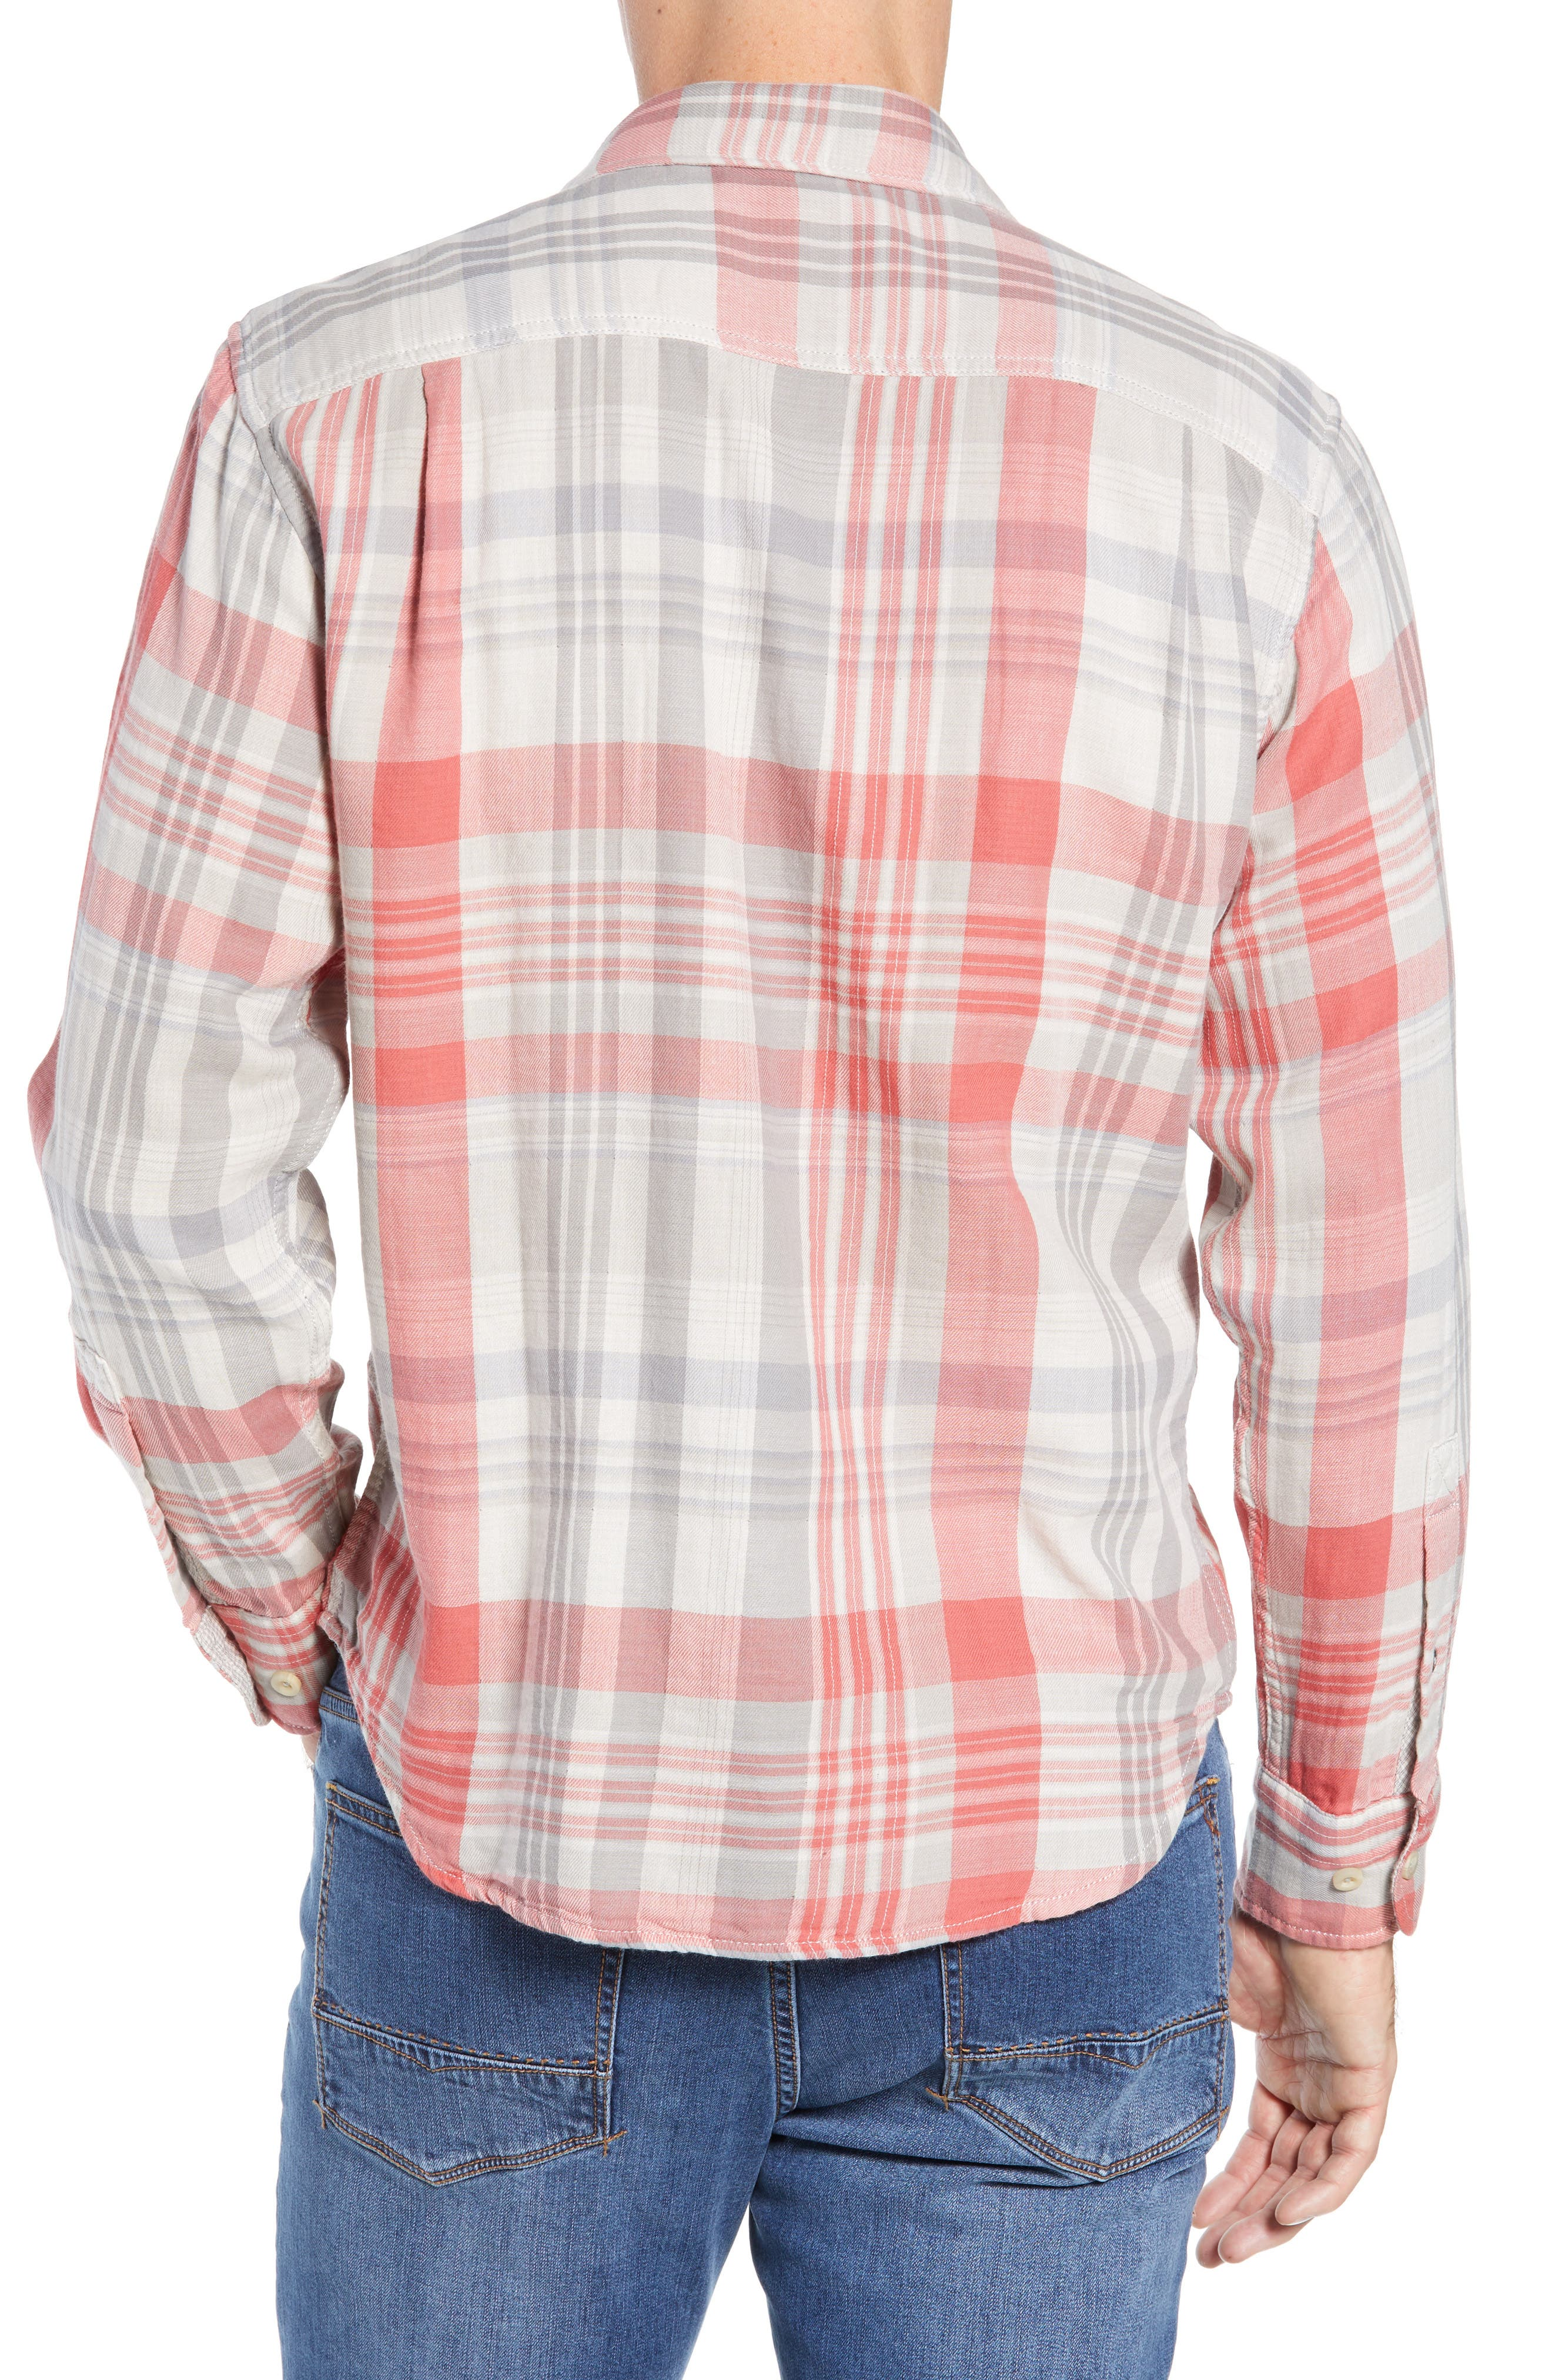 Monteverde Madras Regular Fit Shirt,                             Alternate thumbnail 3, color,                             POINCIANA